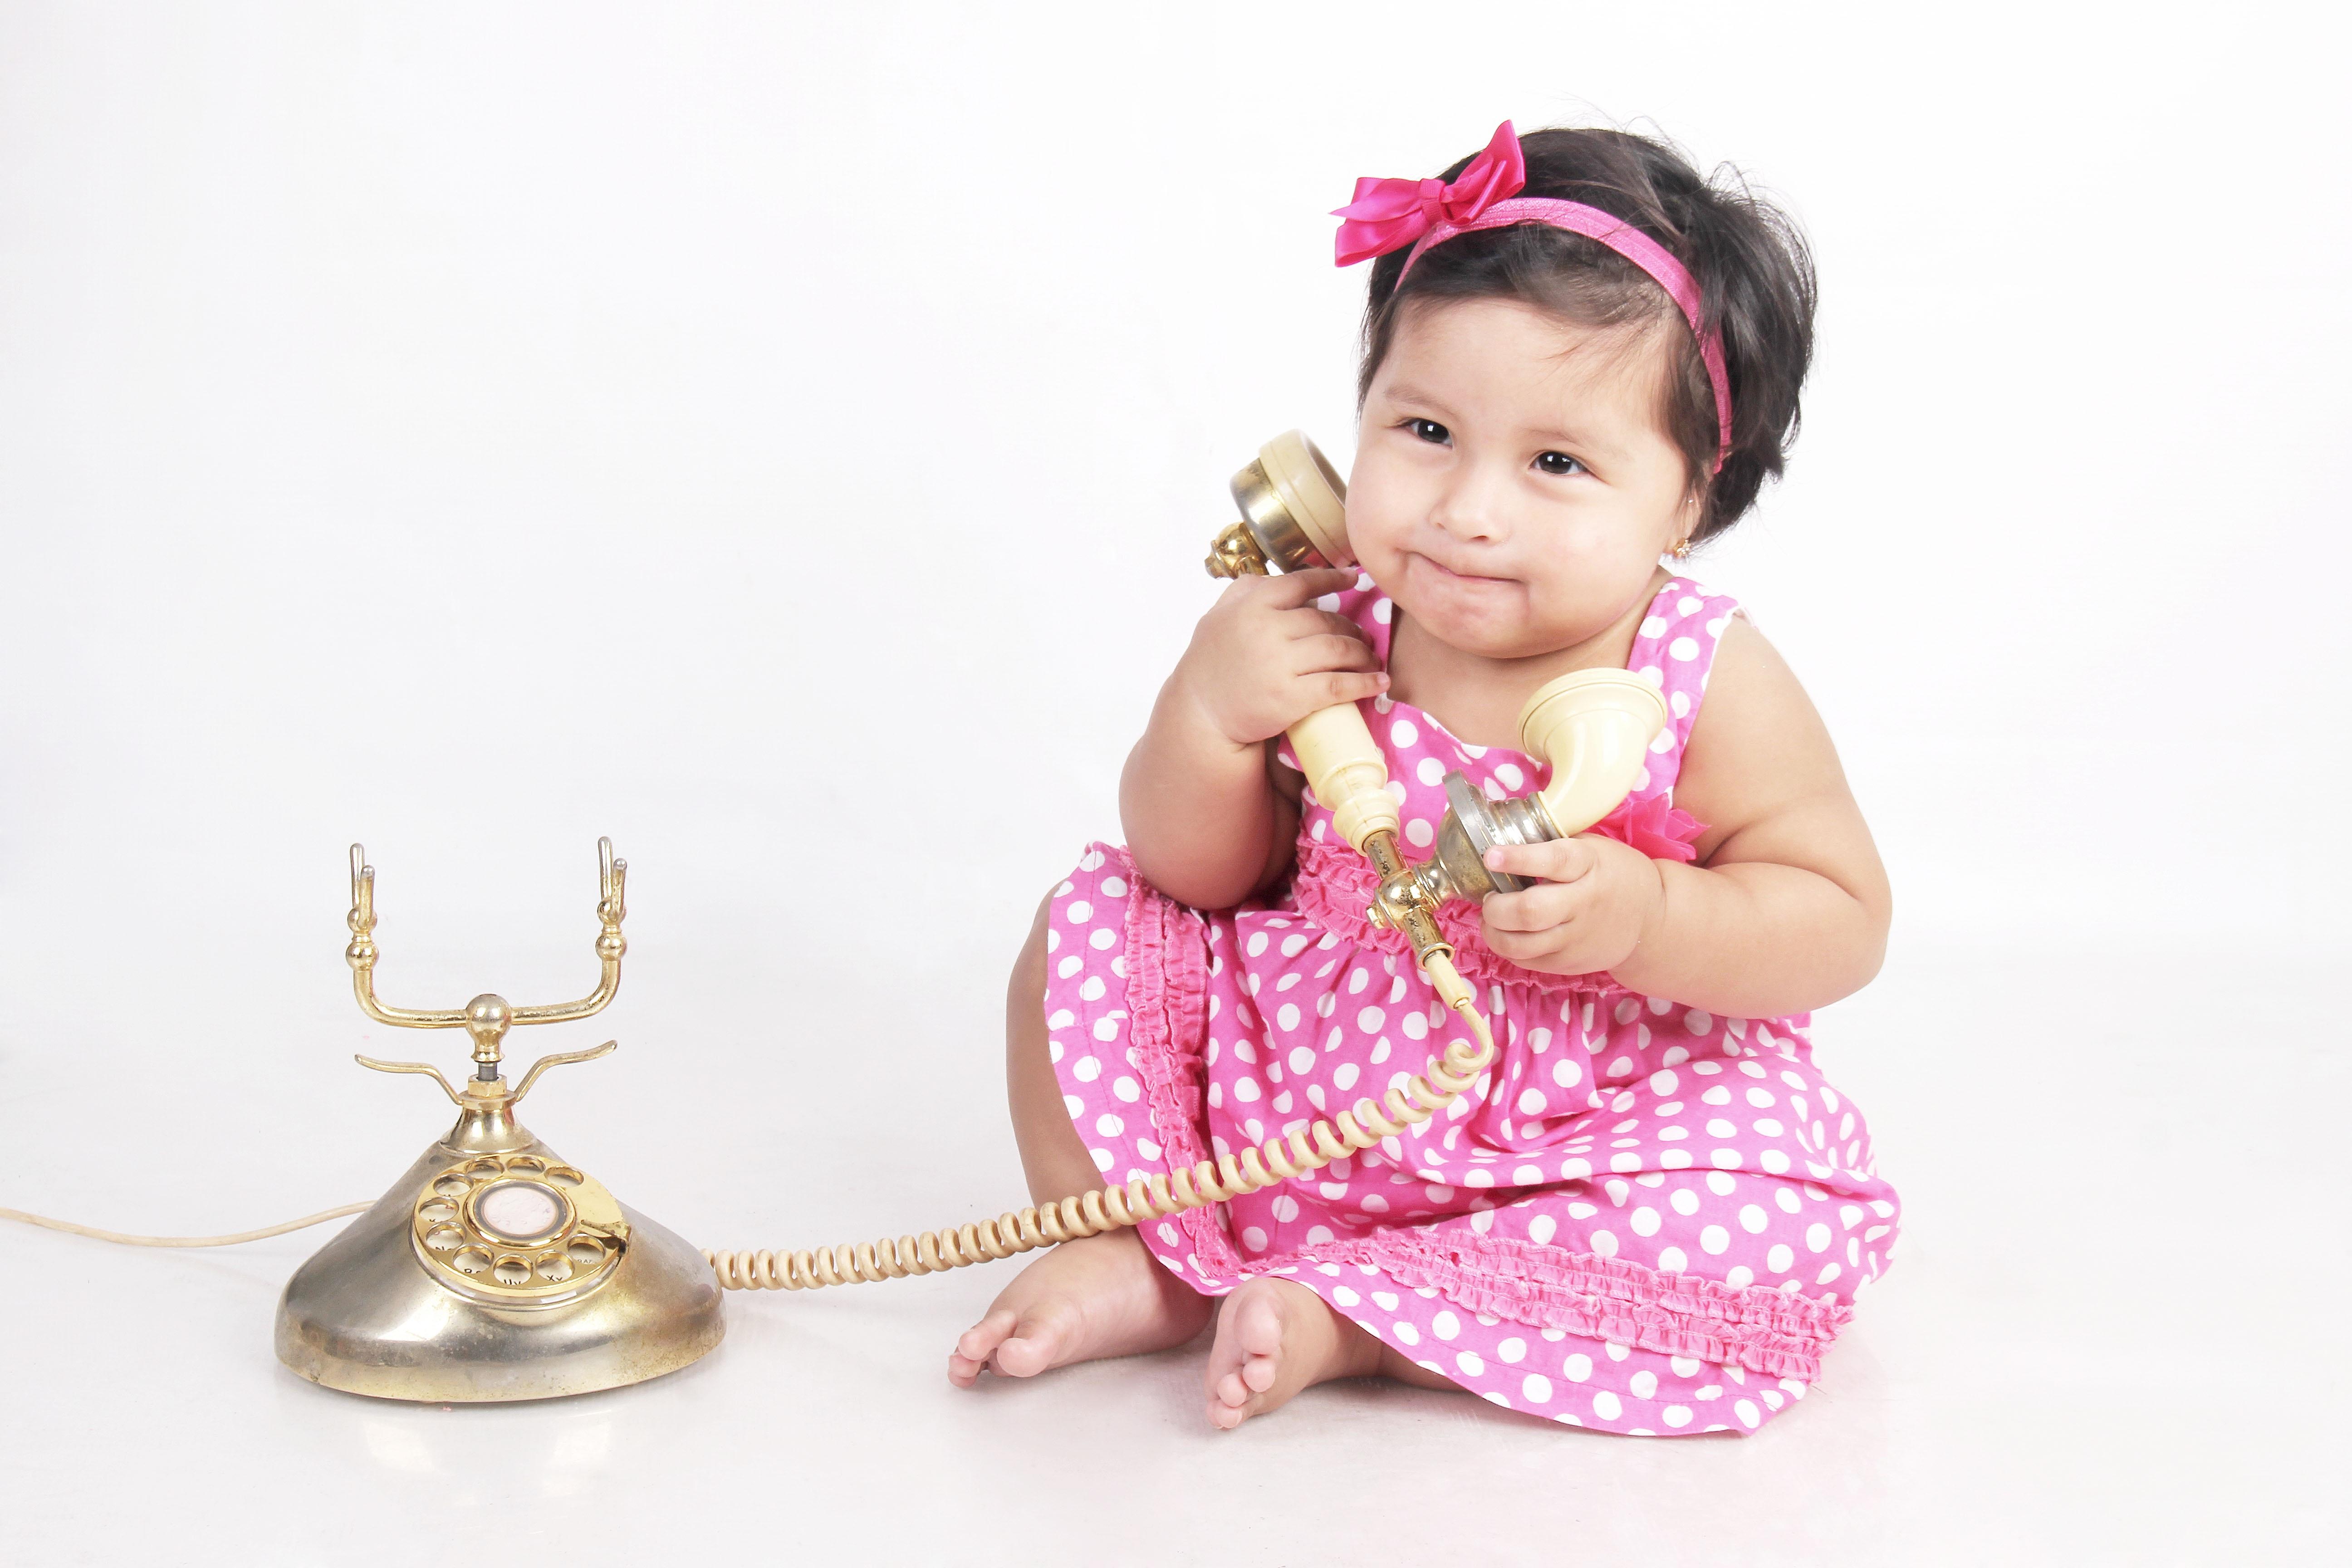 Gambar Gadis Bermain Telepon Berwarna Merah Muda Mainan Koleksi Anak Balita Panggilan Potret Bebe Gaun